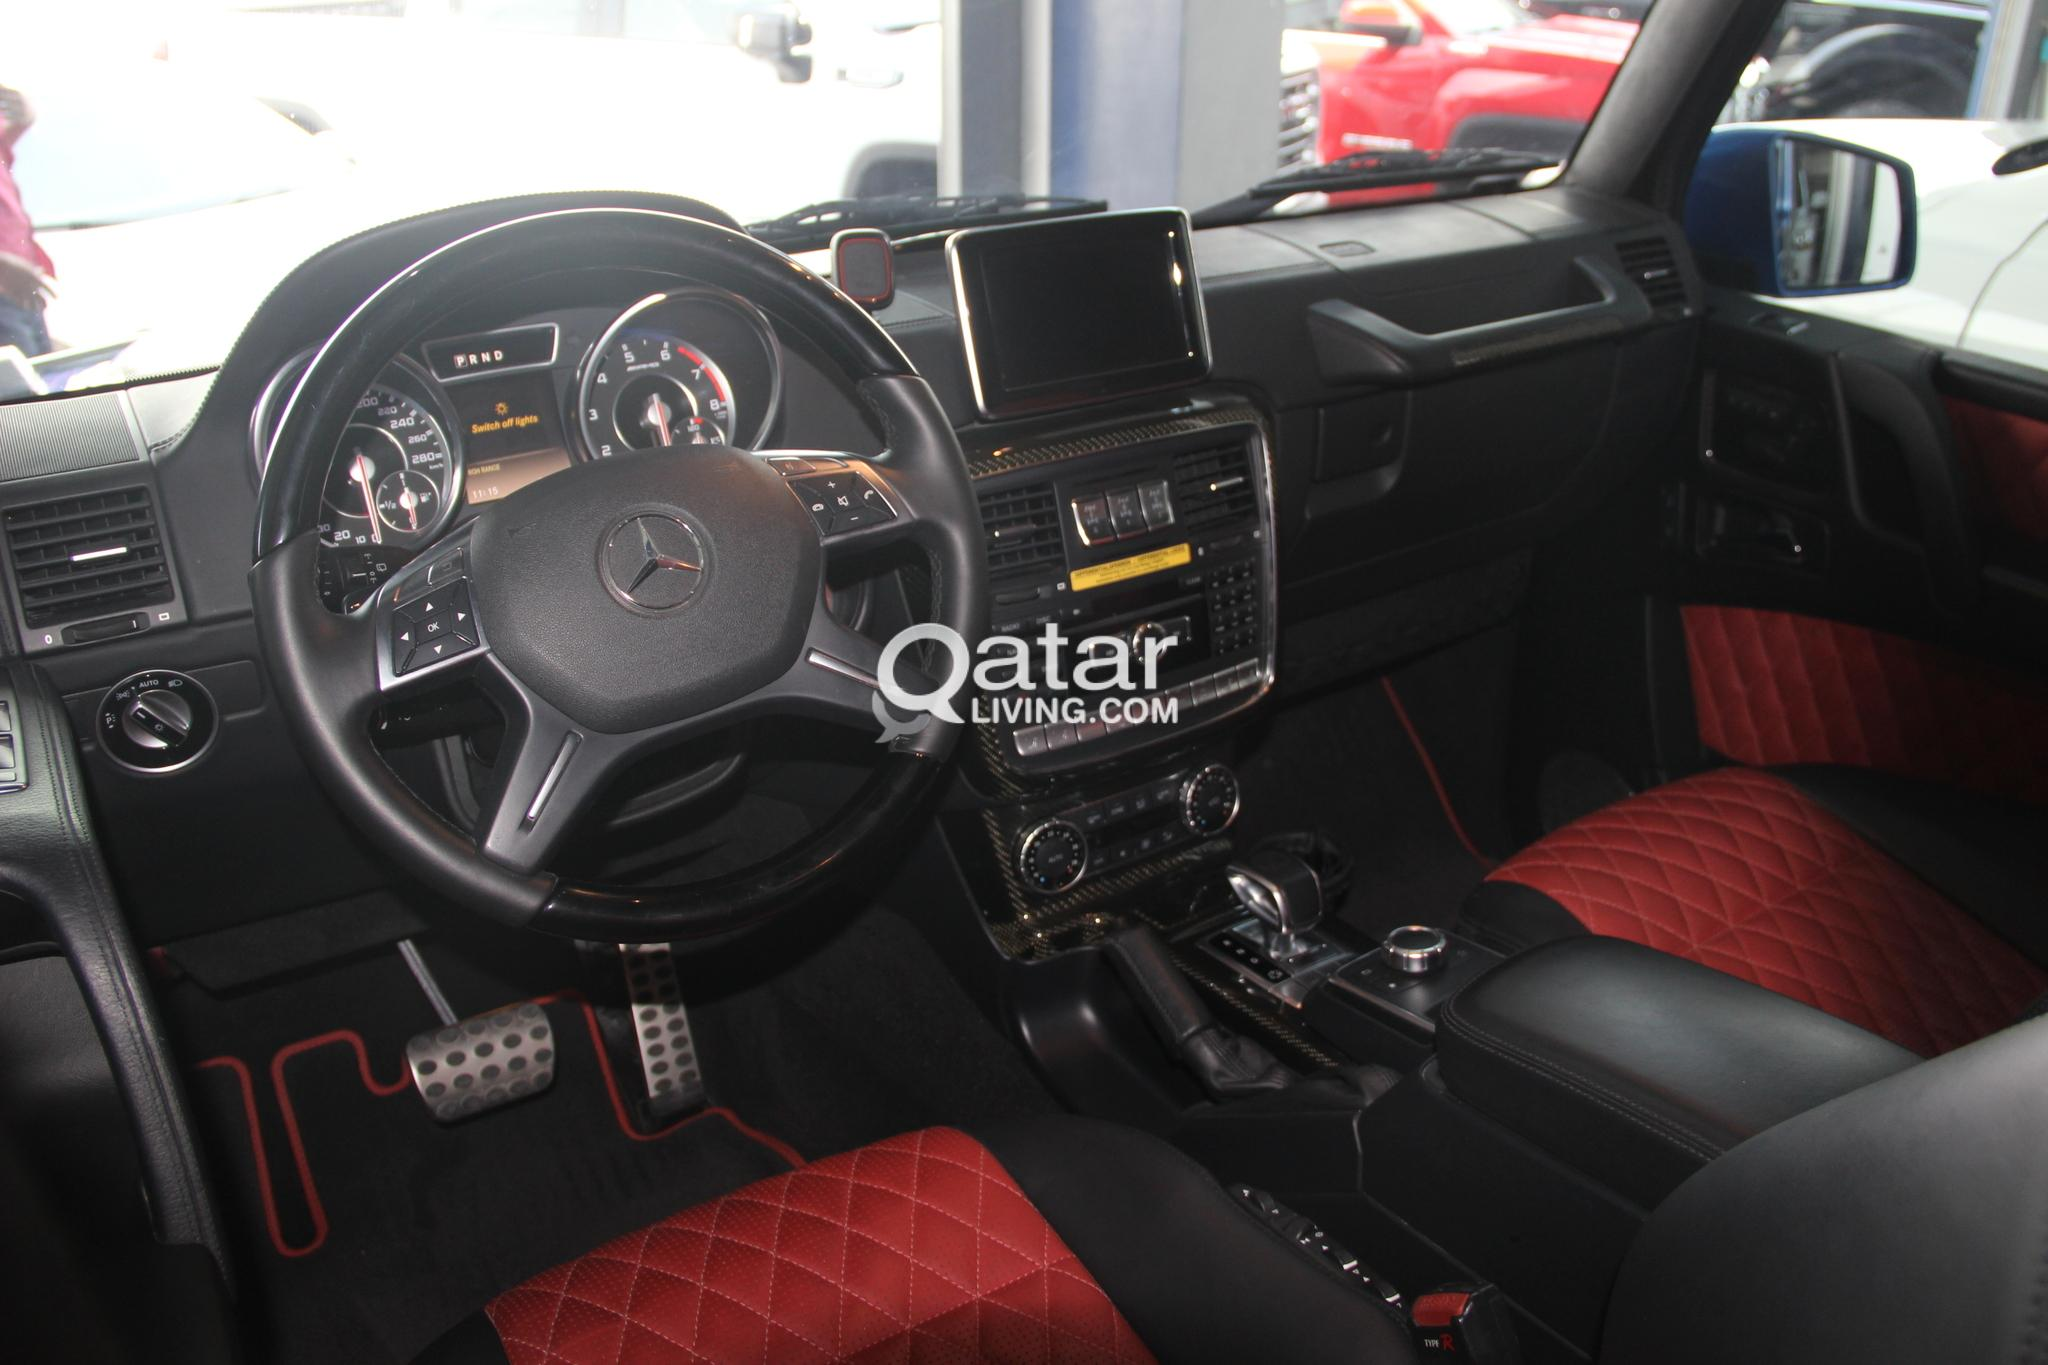 Mercedes G 63 AMG 2014